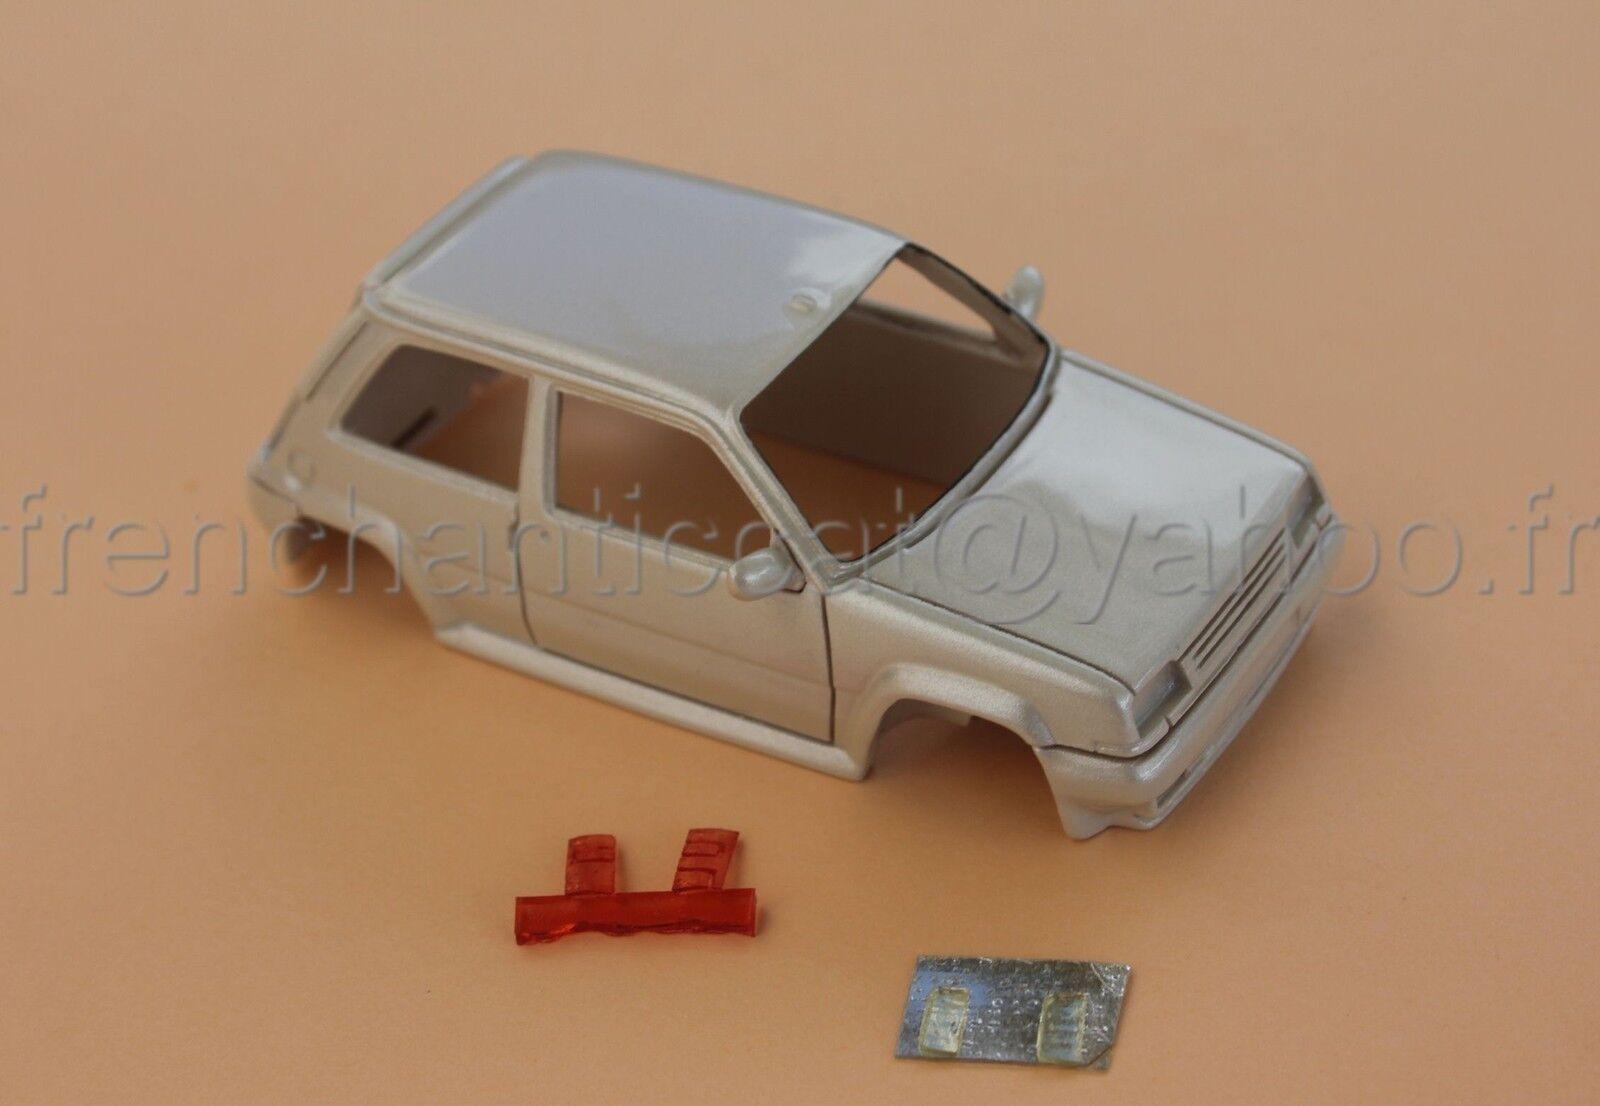 UT voiture 1 43 43 43 Renault super 5 GT cinq collector Heco miniatures car 38555c